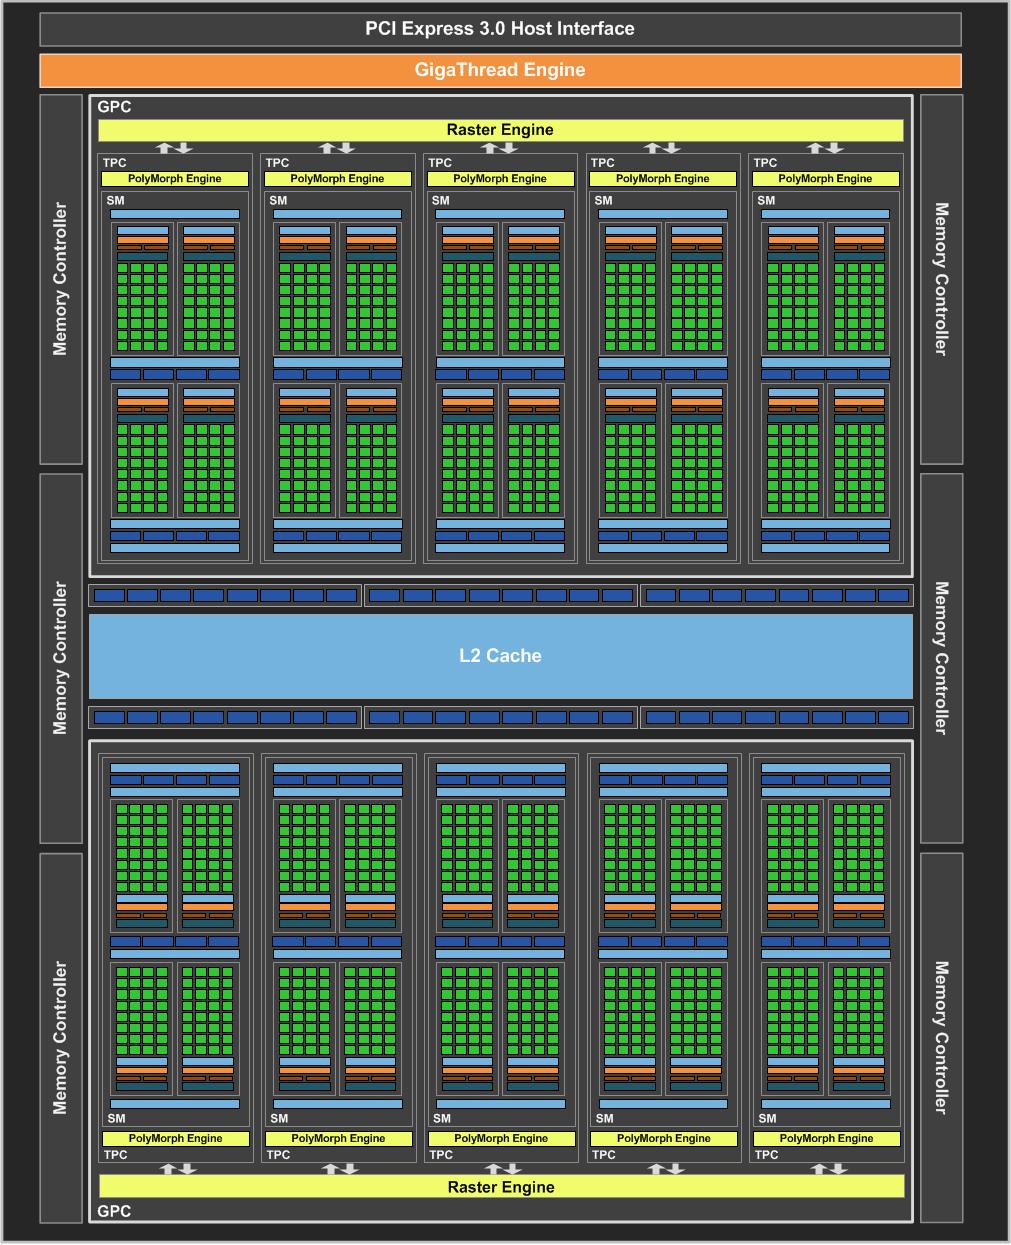 nvidia-geforce-gtx-1060-12